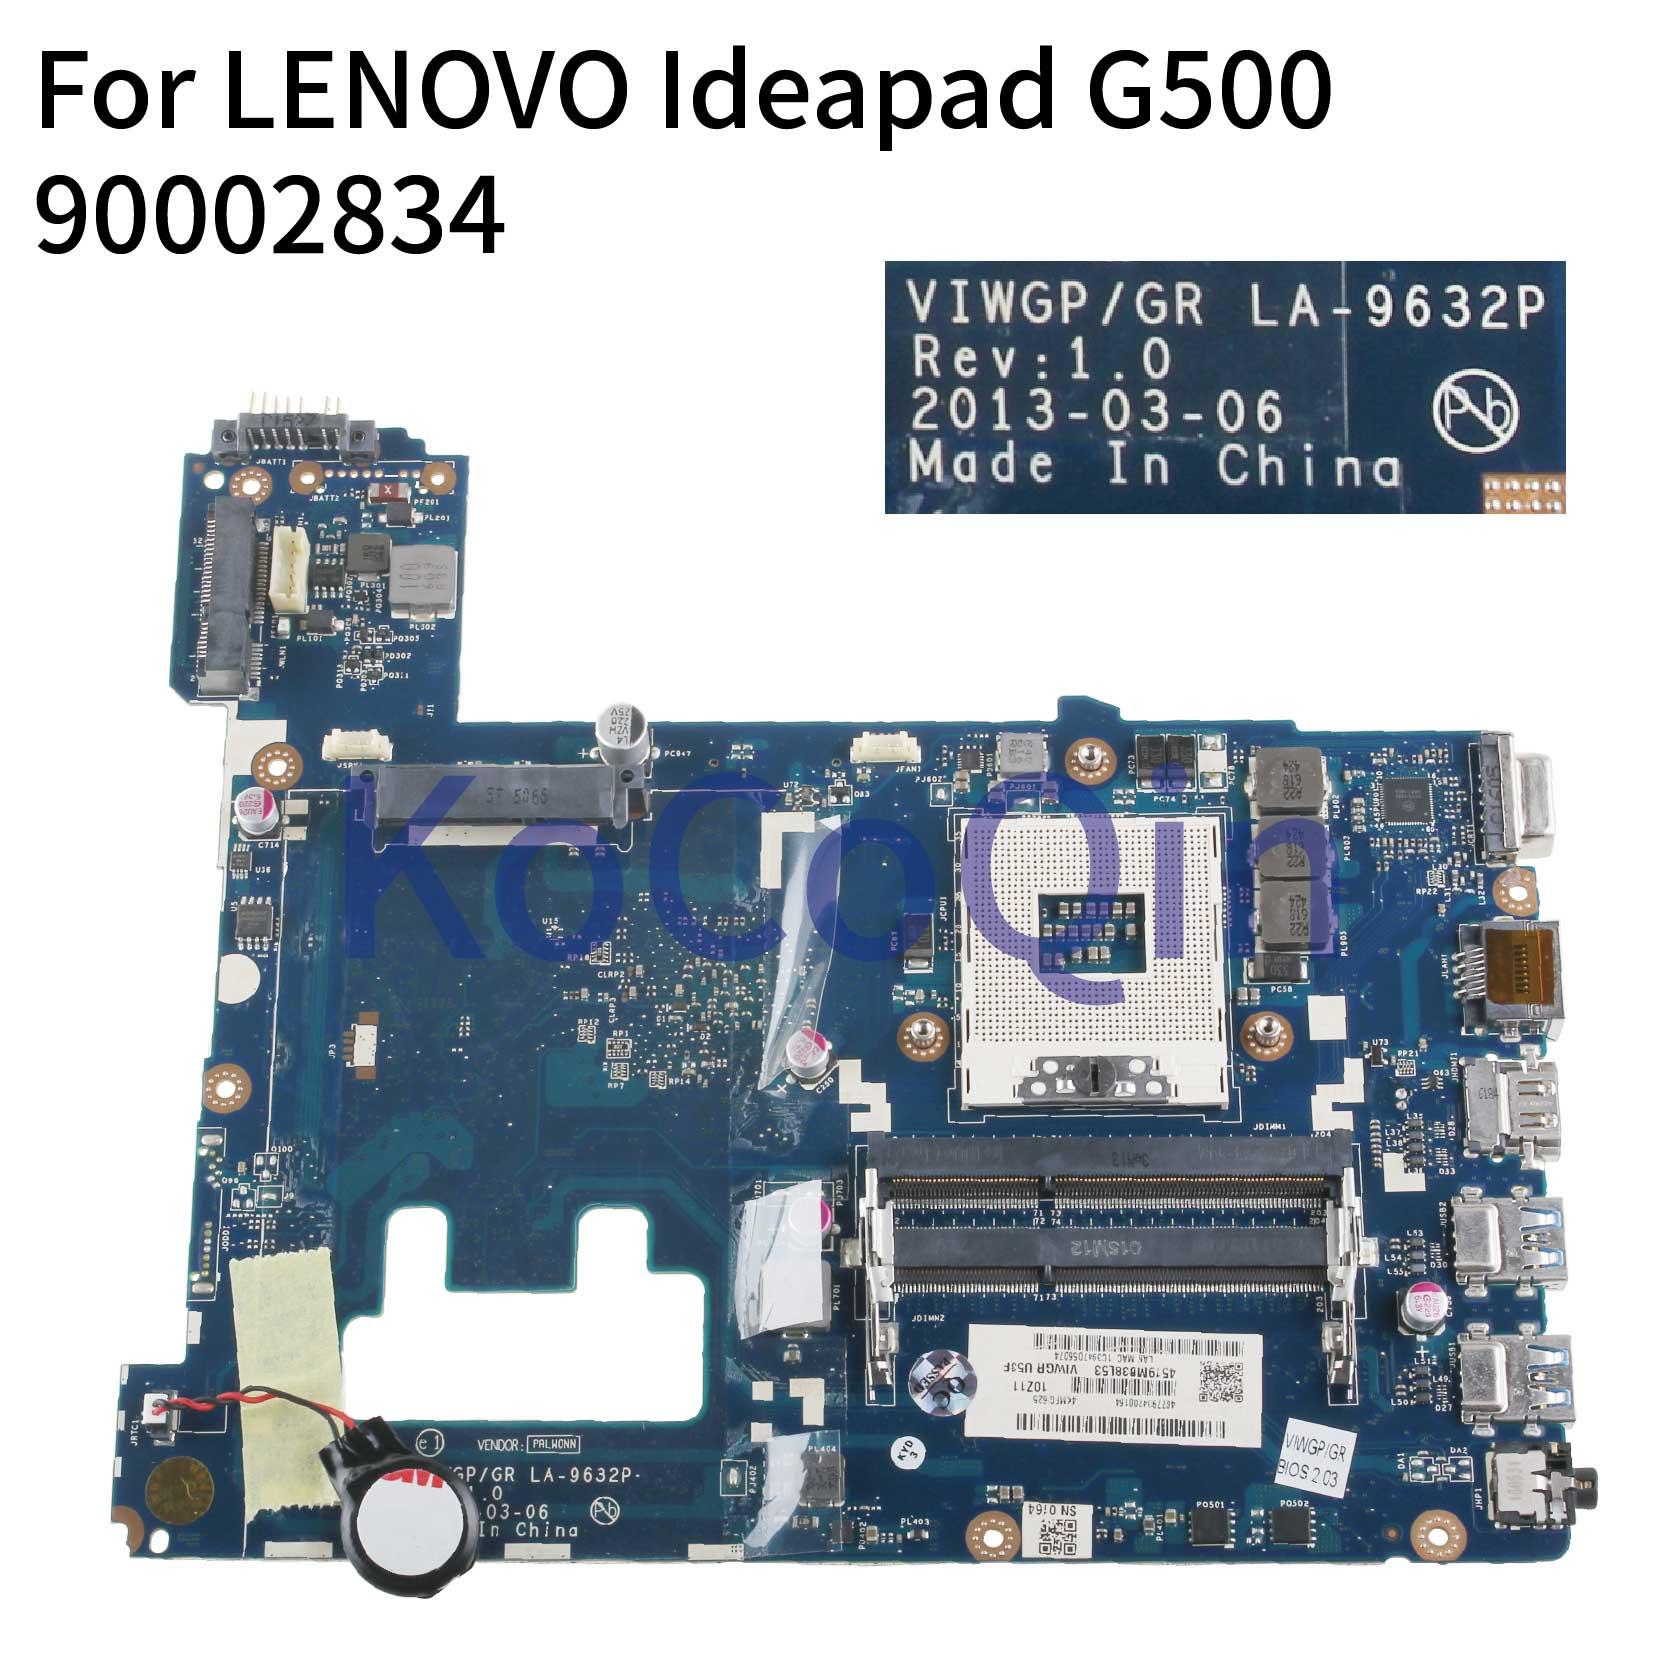 KoCoQin Laptop Motherboard For LENOVO Ideapad G500 HM70 PGA989 Mainboard VIWGP/GR LA-9632P 90002834 SJTNV